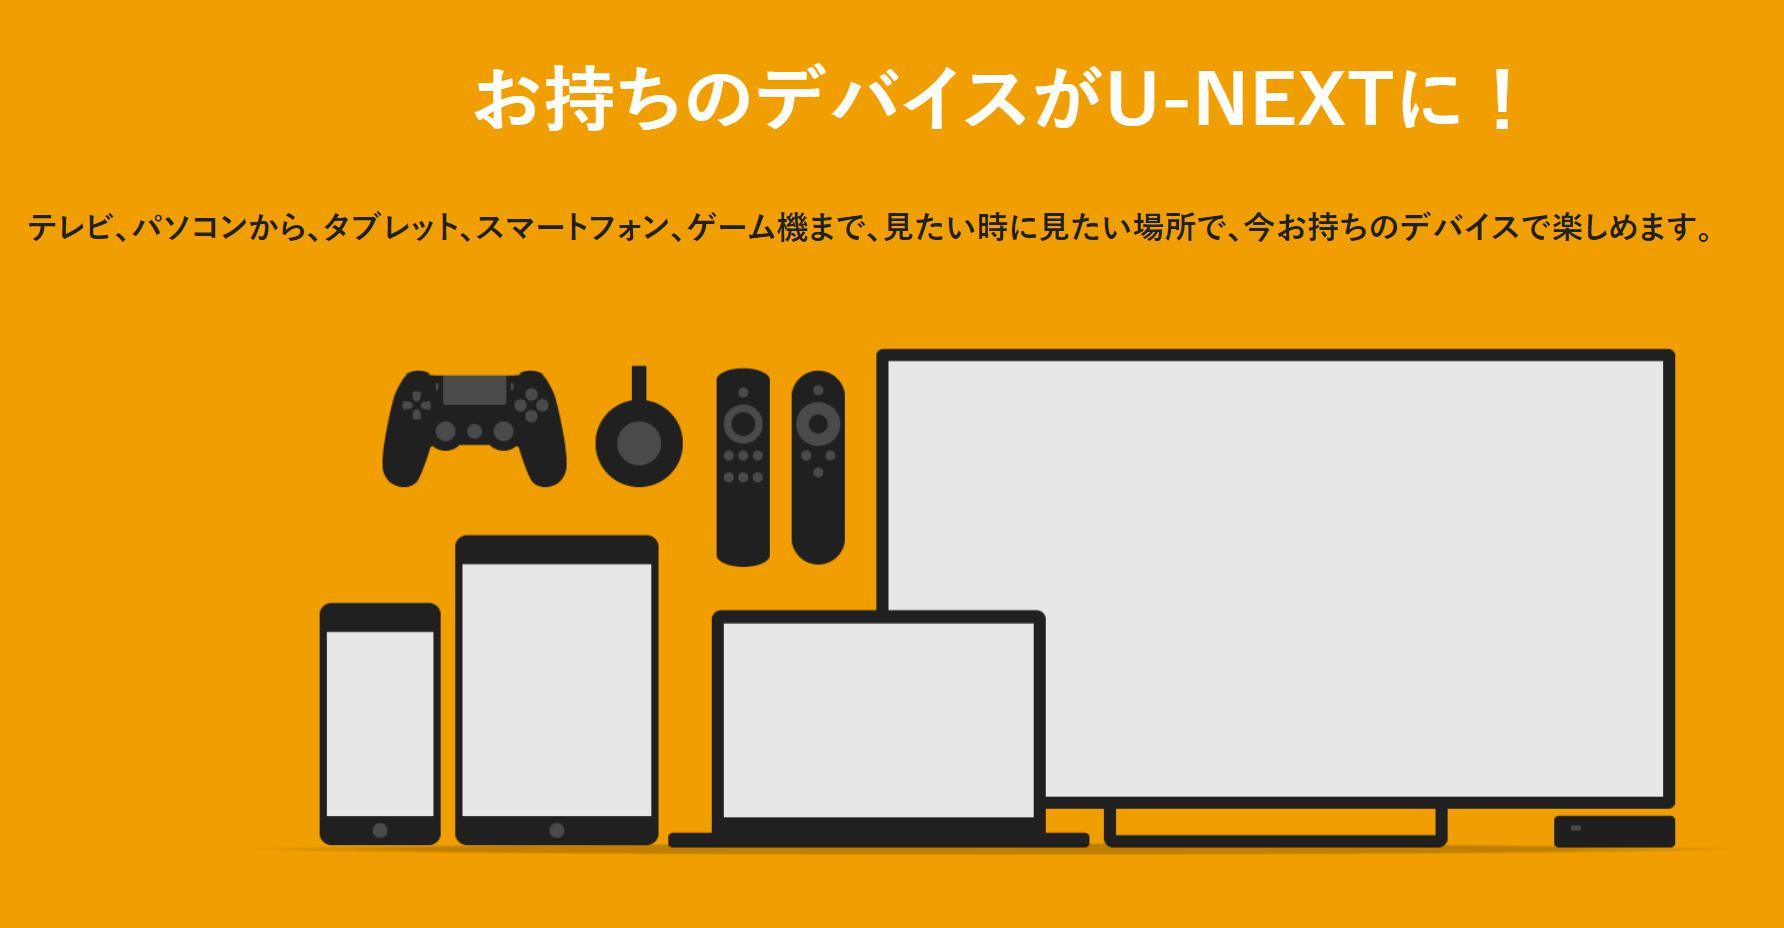 U-NEXTはマルチデバイス対応!